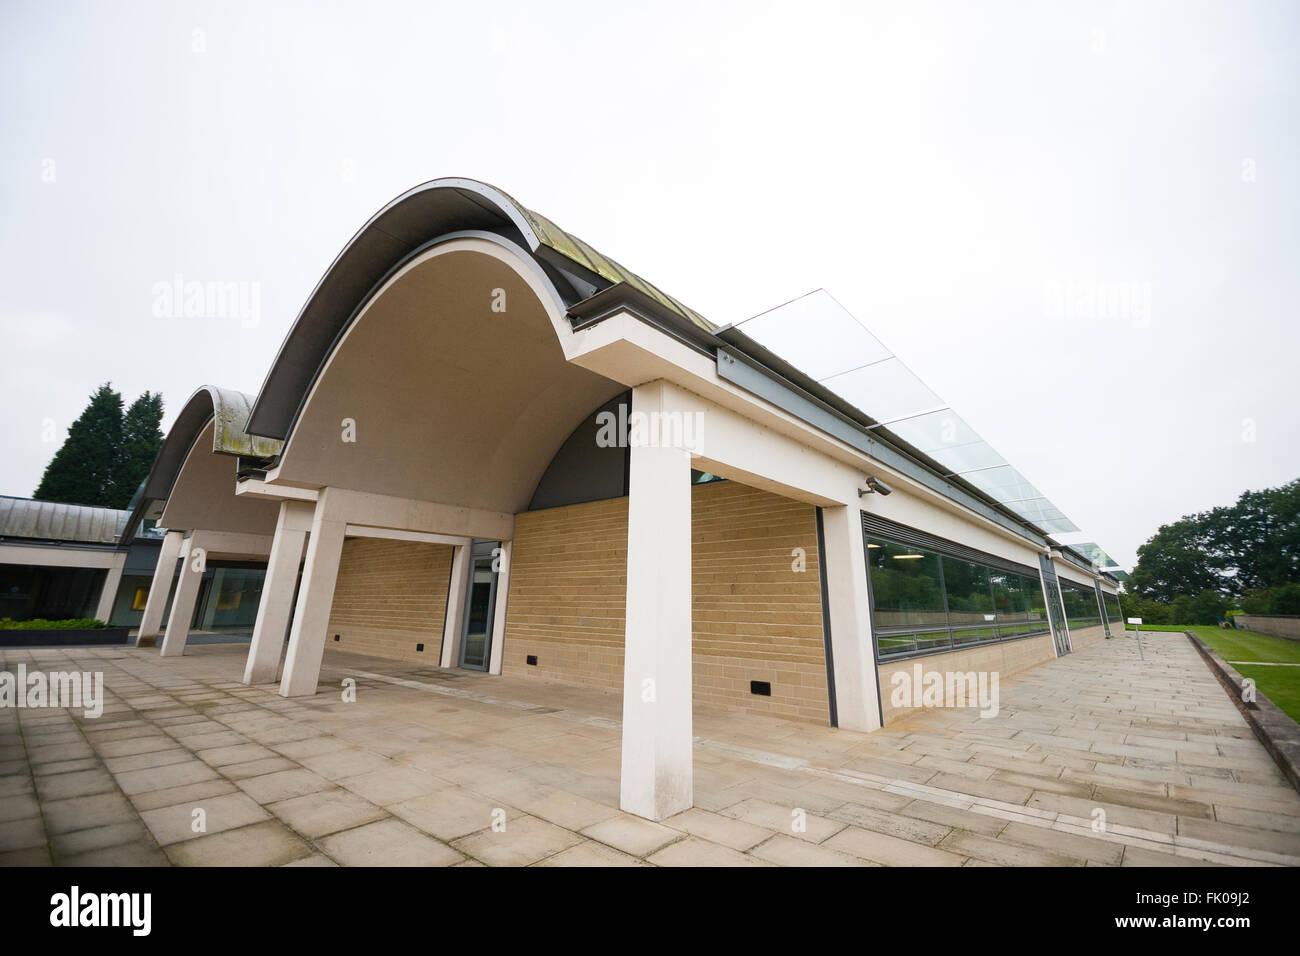 Kew Millenium Seedbank, West Sussex, UK. External view of Millennium seed bank visitor's centre. - Stock Image